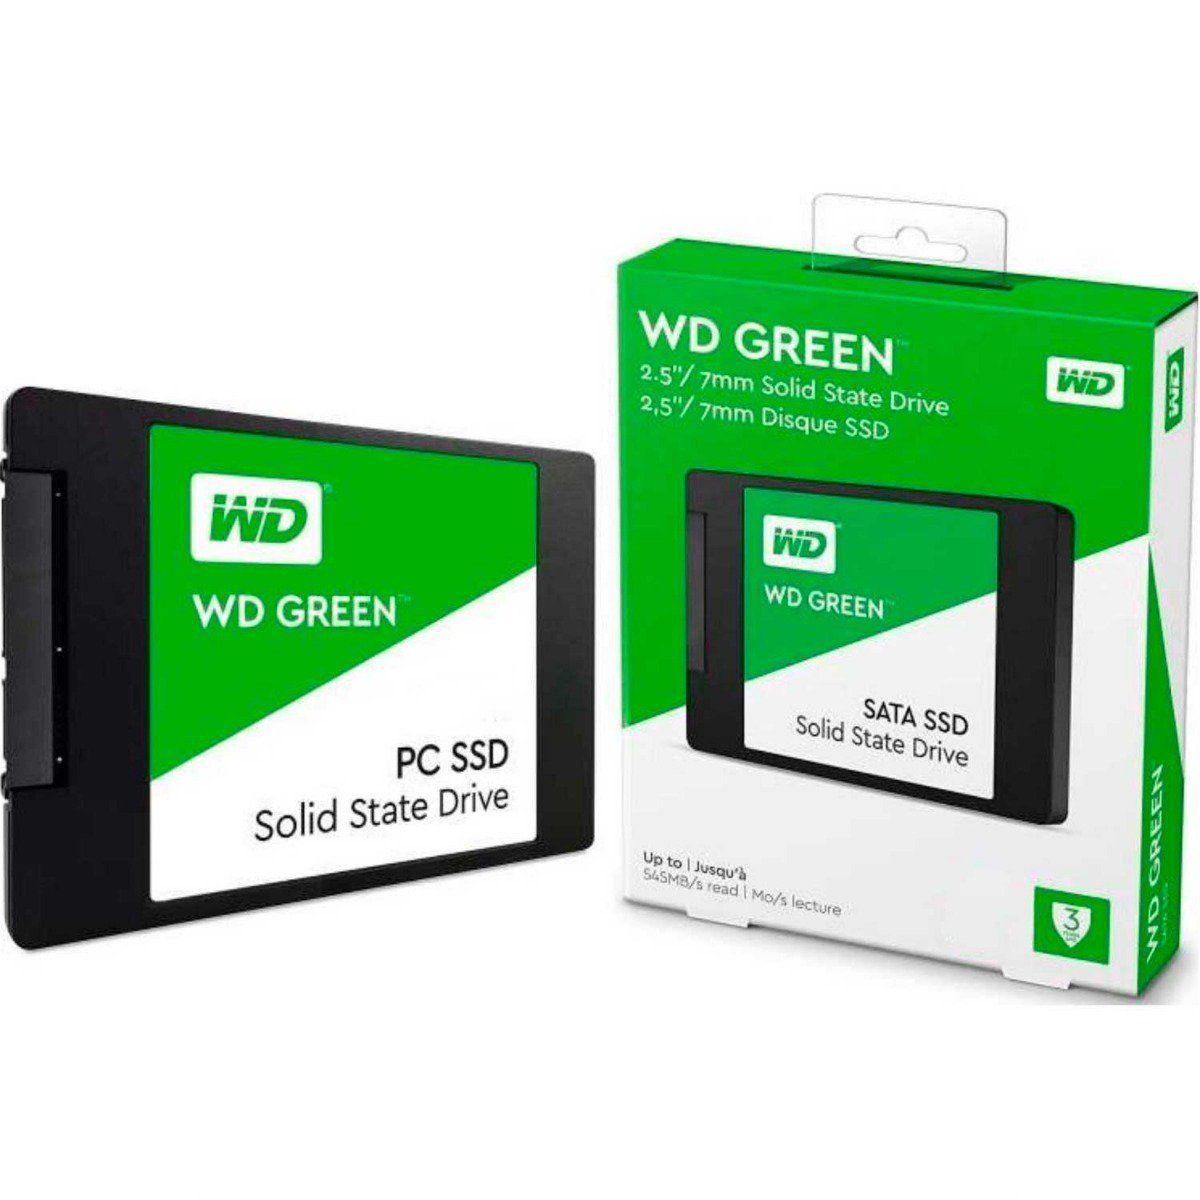 Ssd 480gb Western Digital Green Sata 3 2,5 7mm